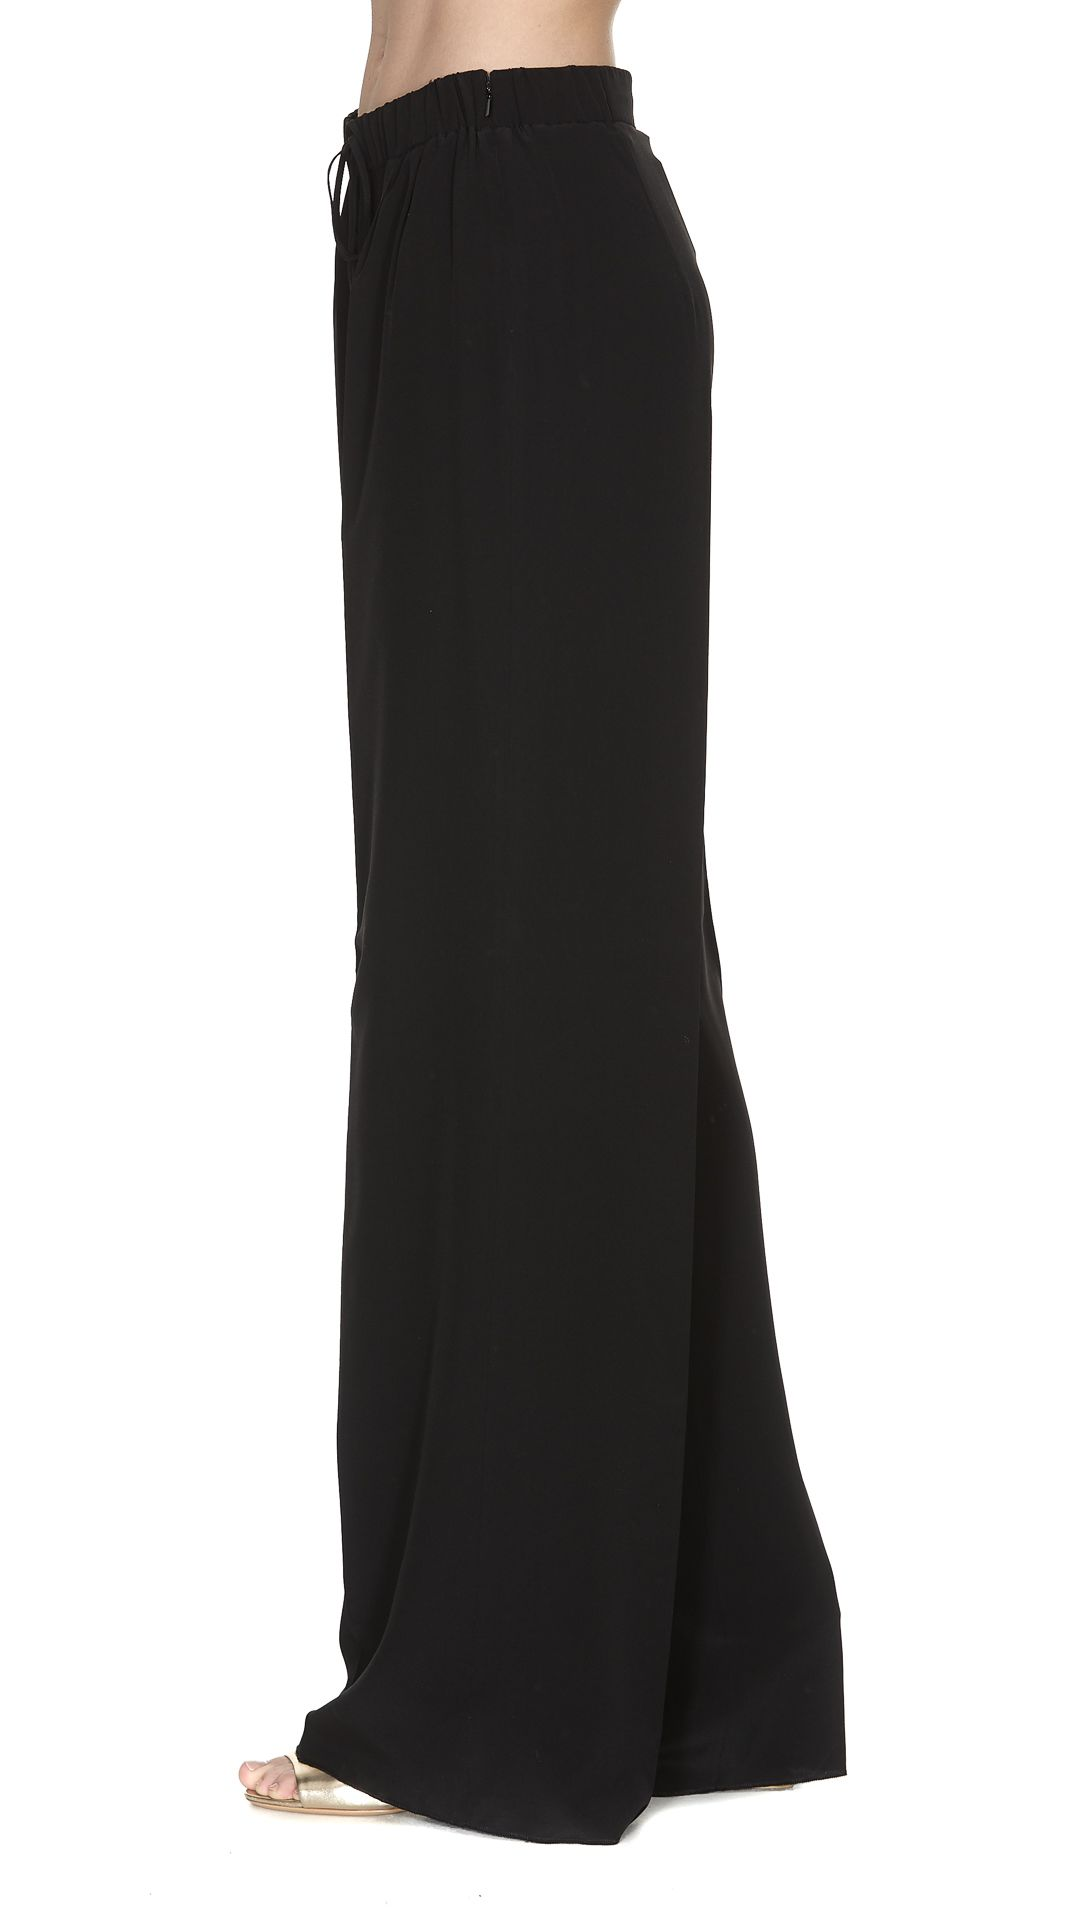 Black Tremiti trousers Max Mara MPK1eYV